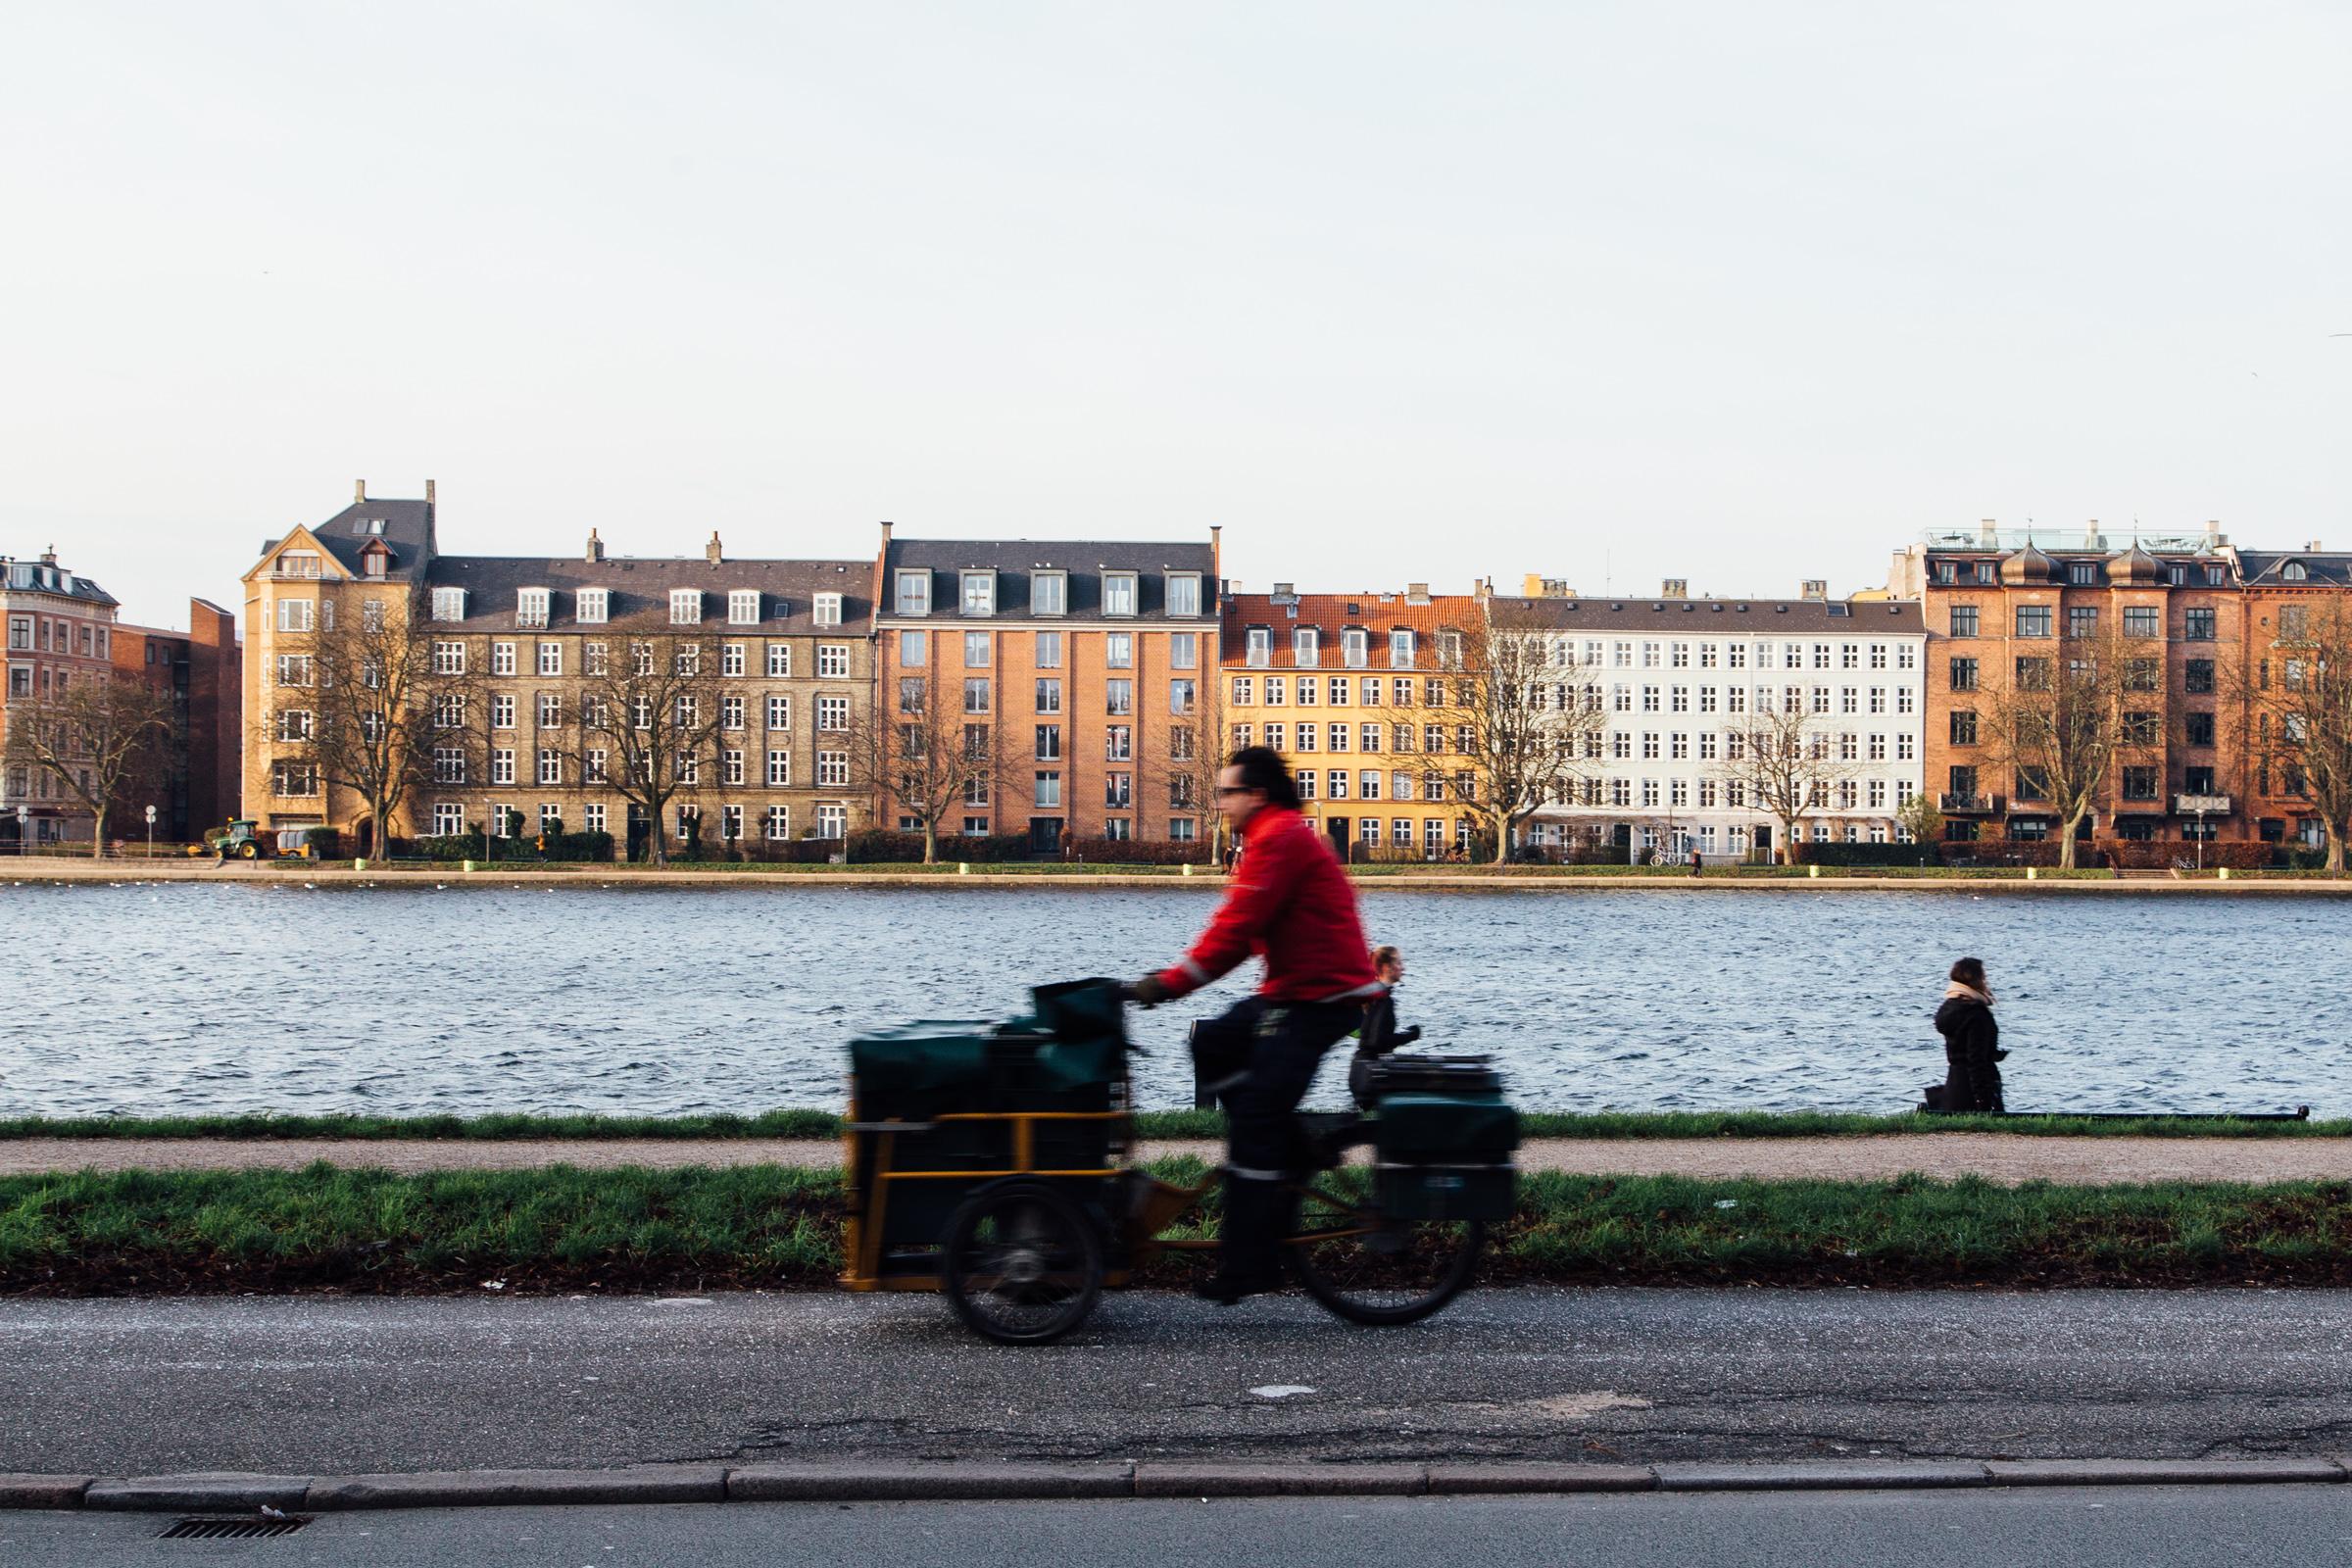 copenhagen_bikes-2111.jpg